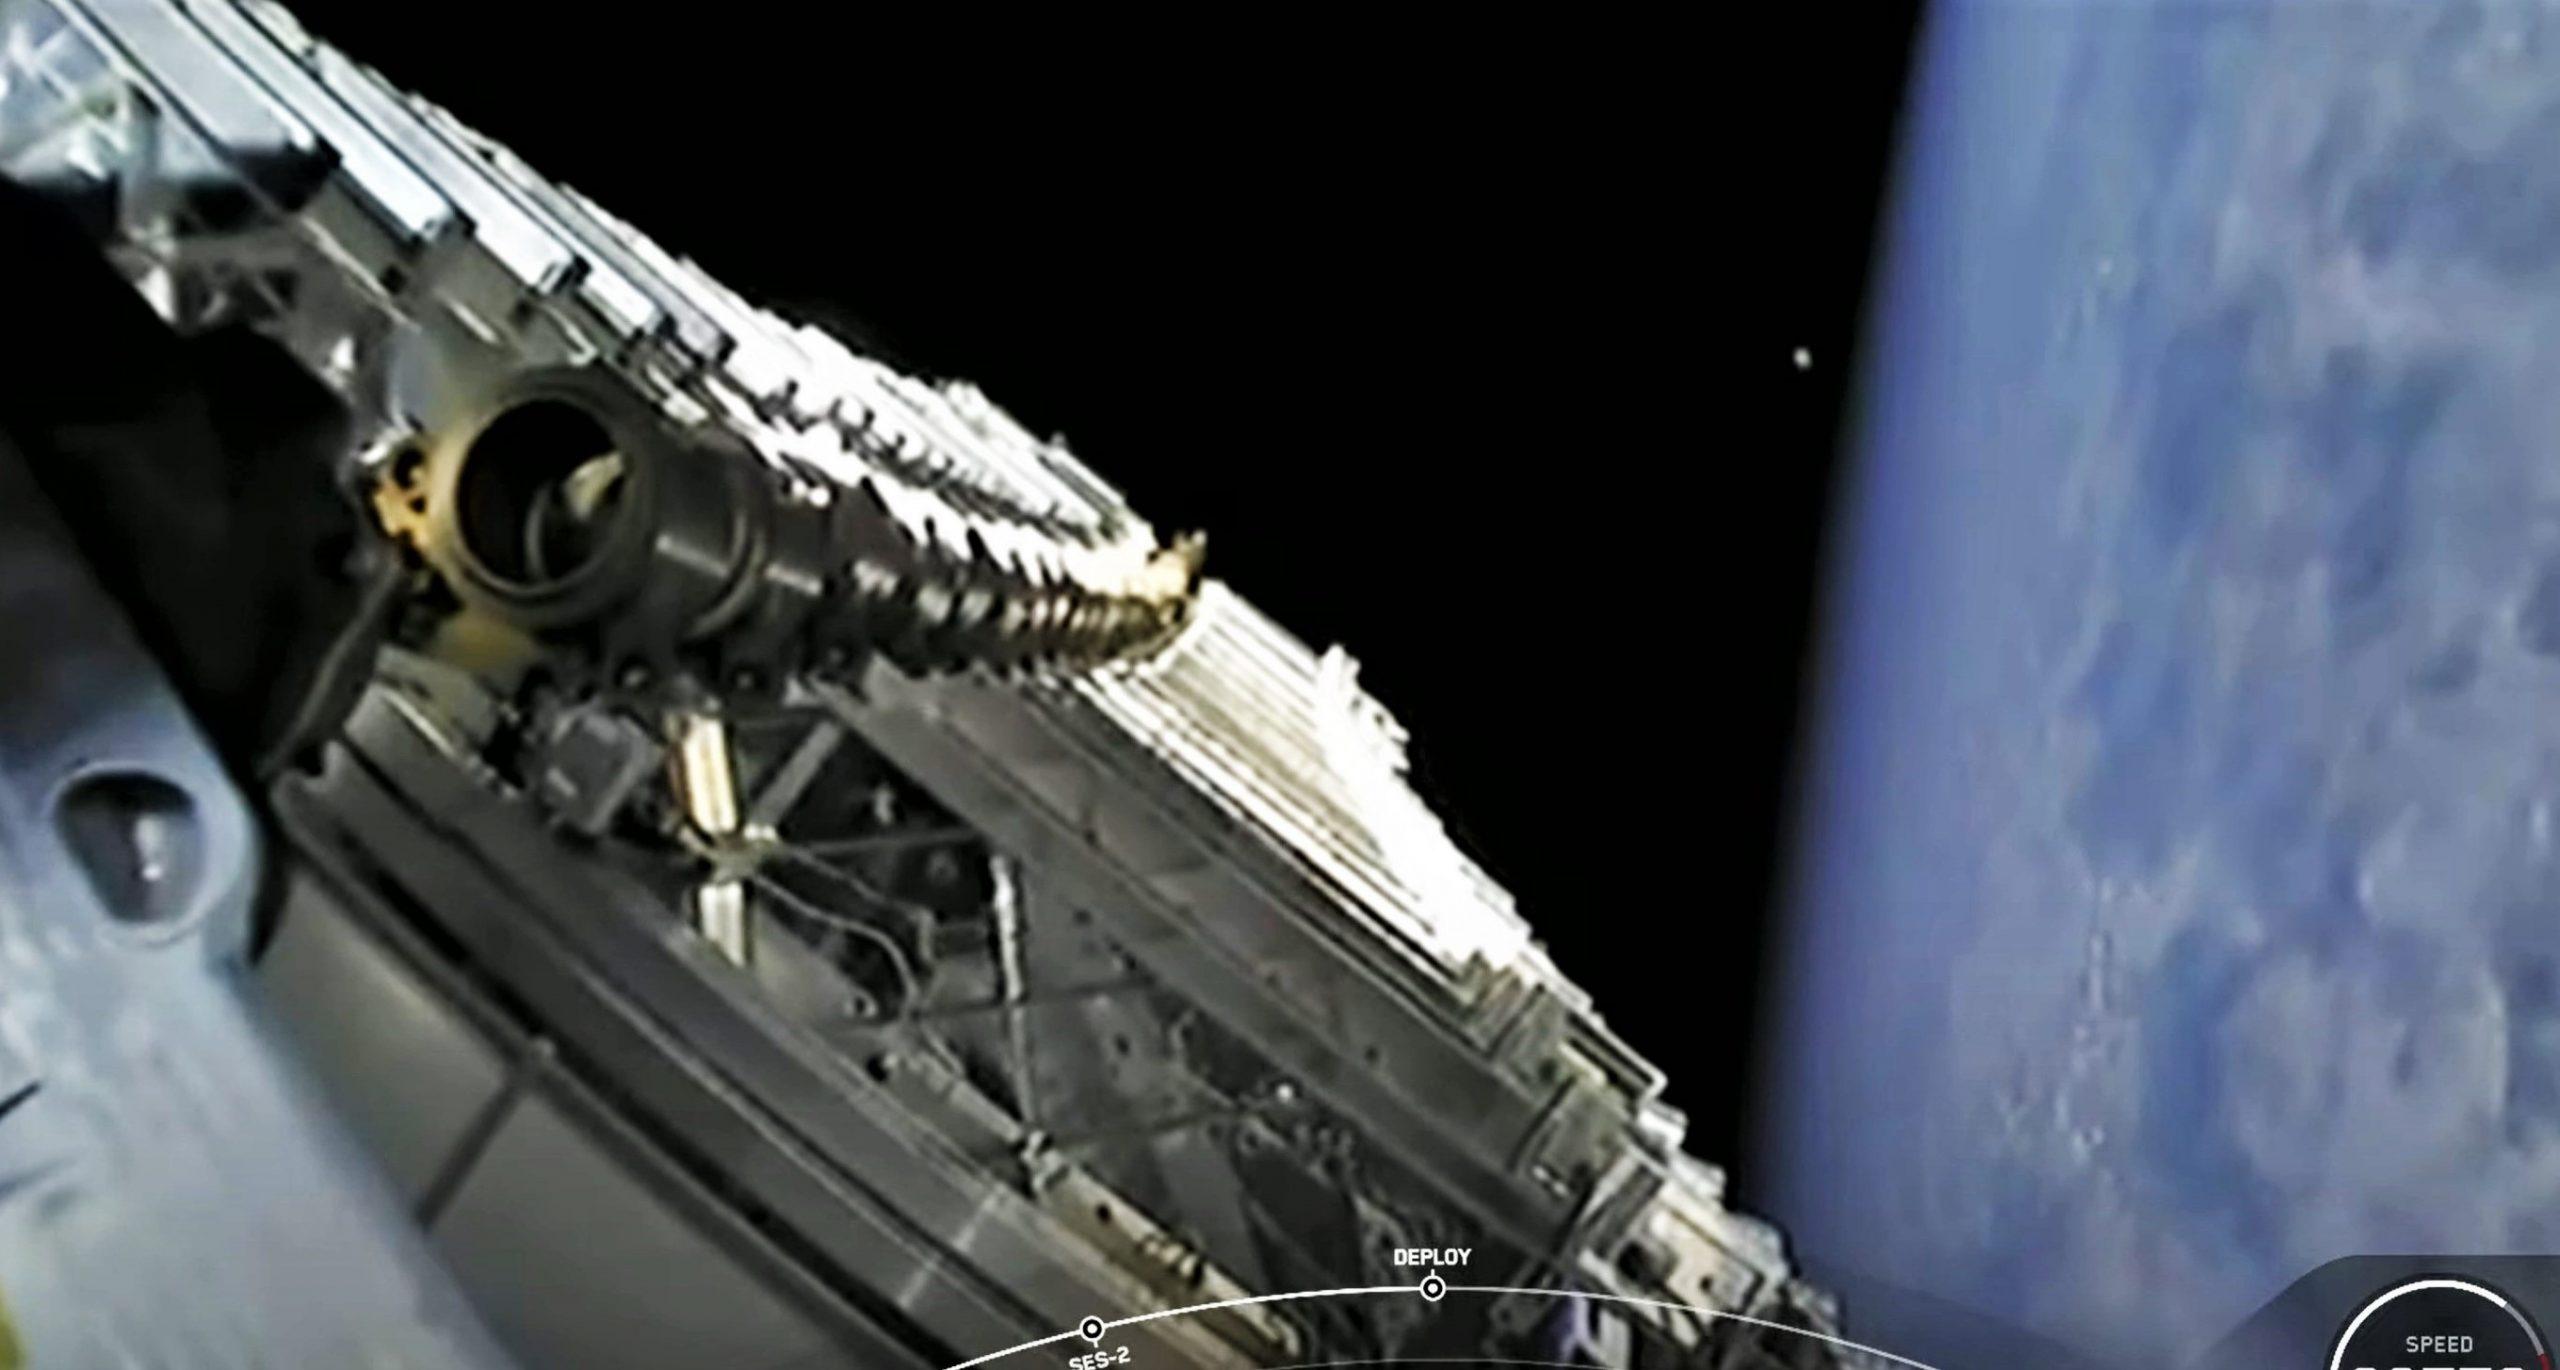 Starlink-24 Falcon 9 B1060 LC-40 042821 webcast (SpaceX) deploy 1 crop